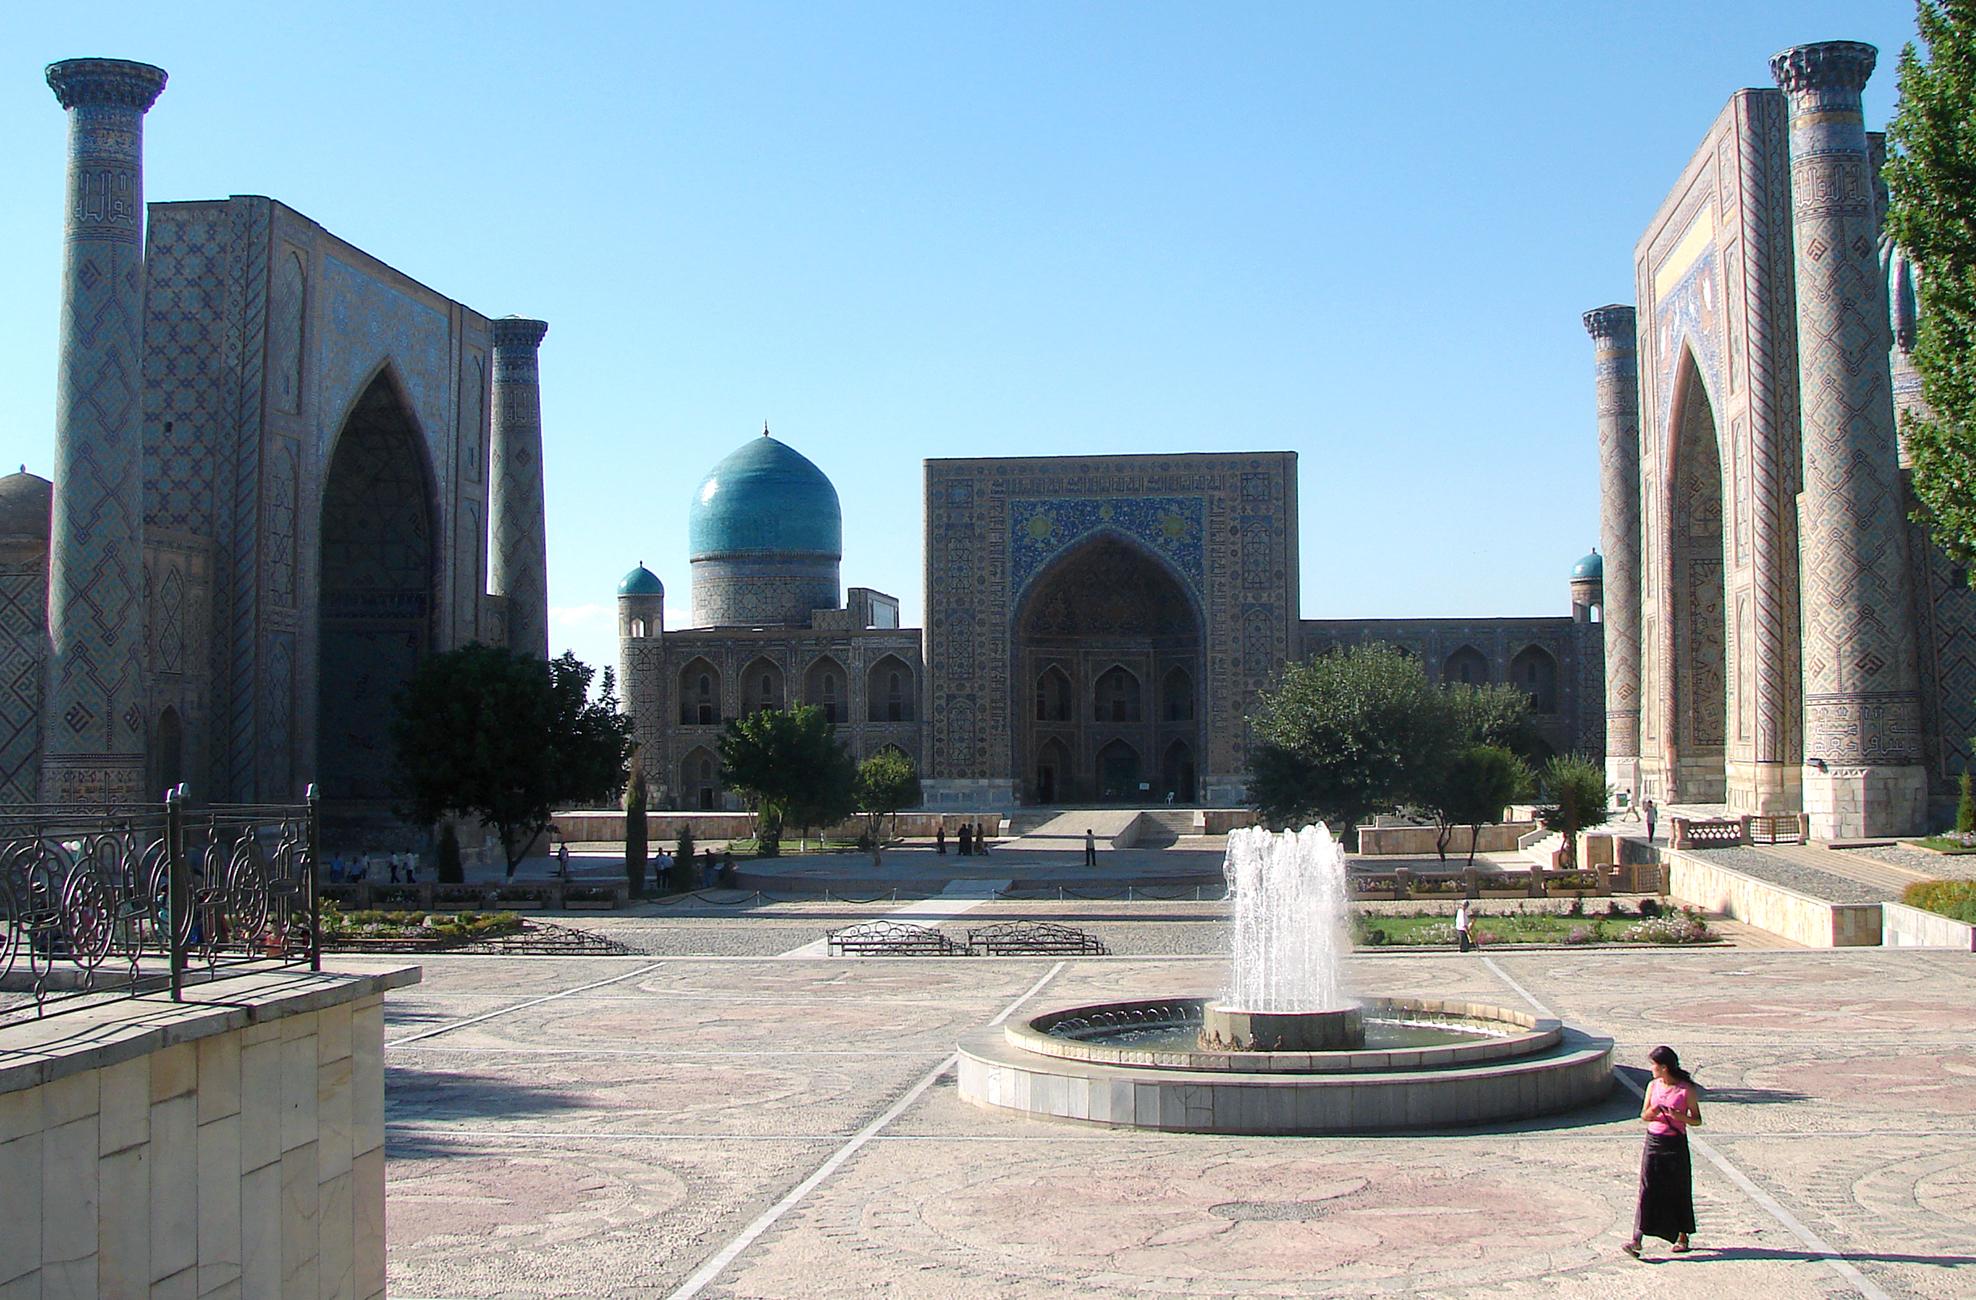 Uzbekistan launches 'Samarkand City' project